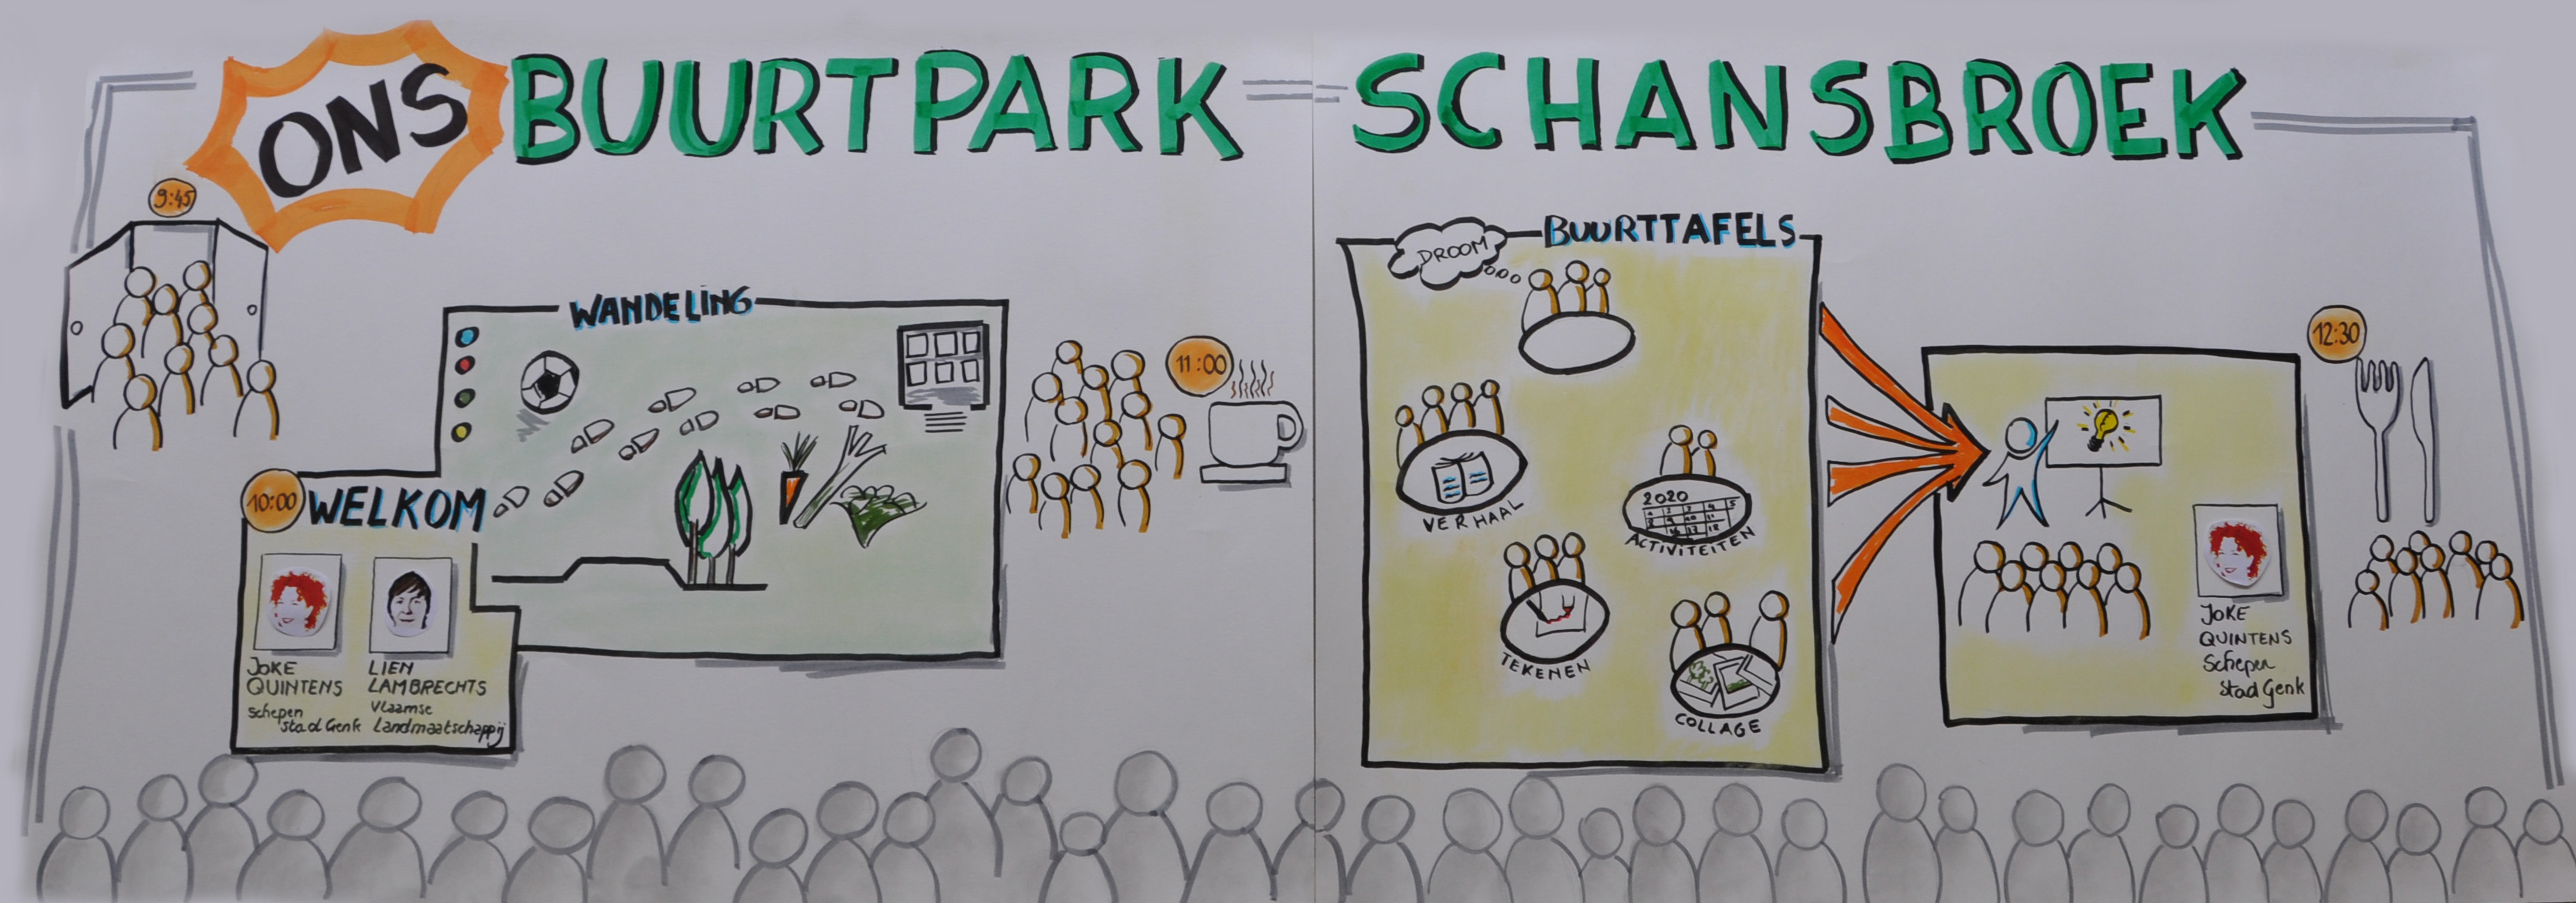 buurtpark Schansbroek